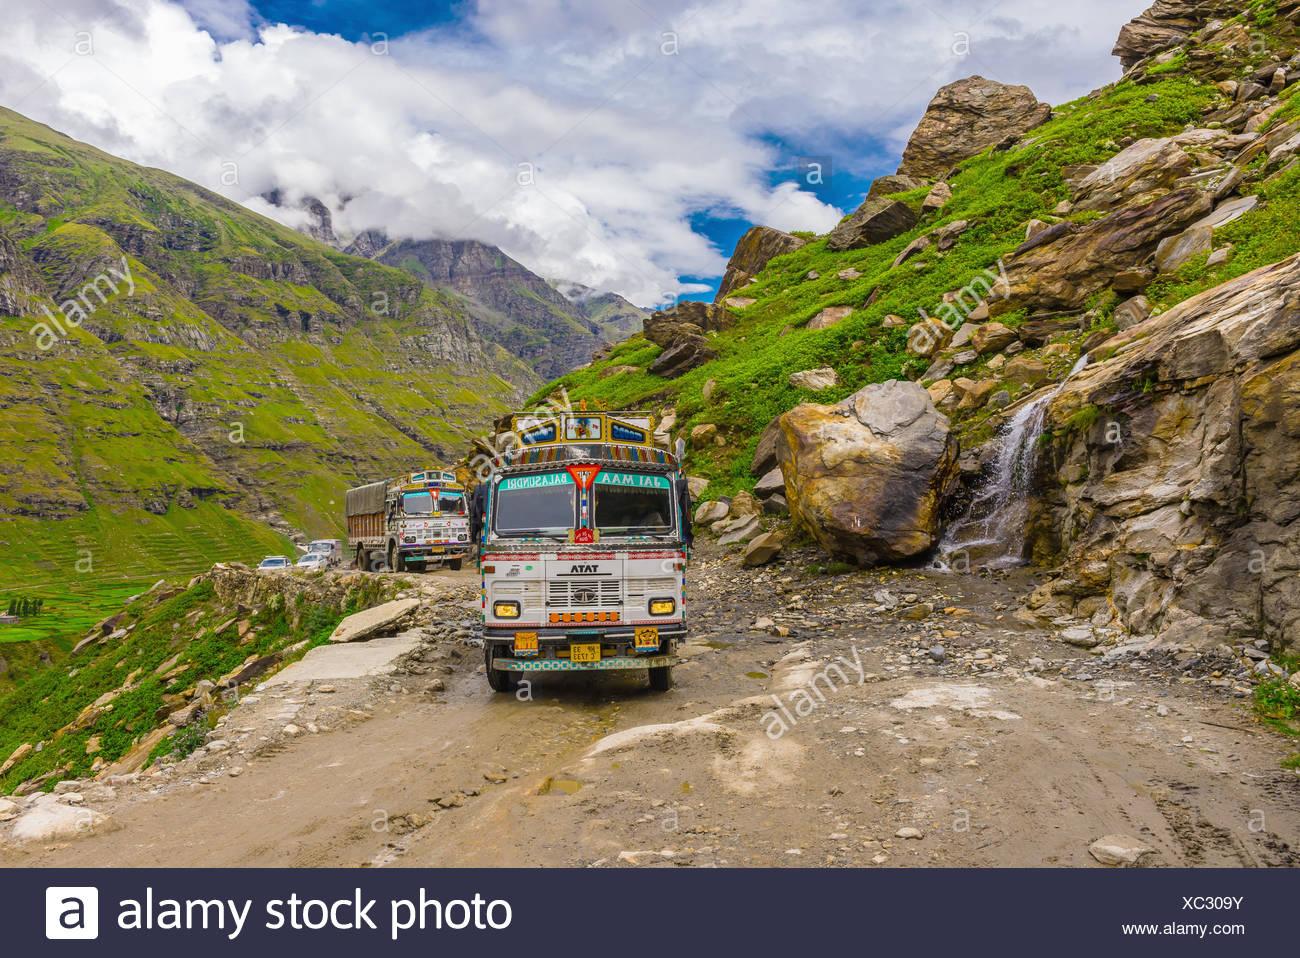 13 Asia cloud color image connect foot highway Himachal Pradesh Himalayas horizontal India lahaul Leh-Manali Manali near panjal - Stock Image